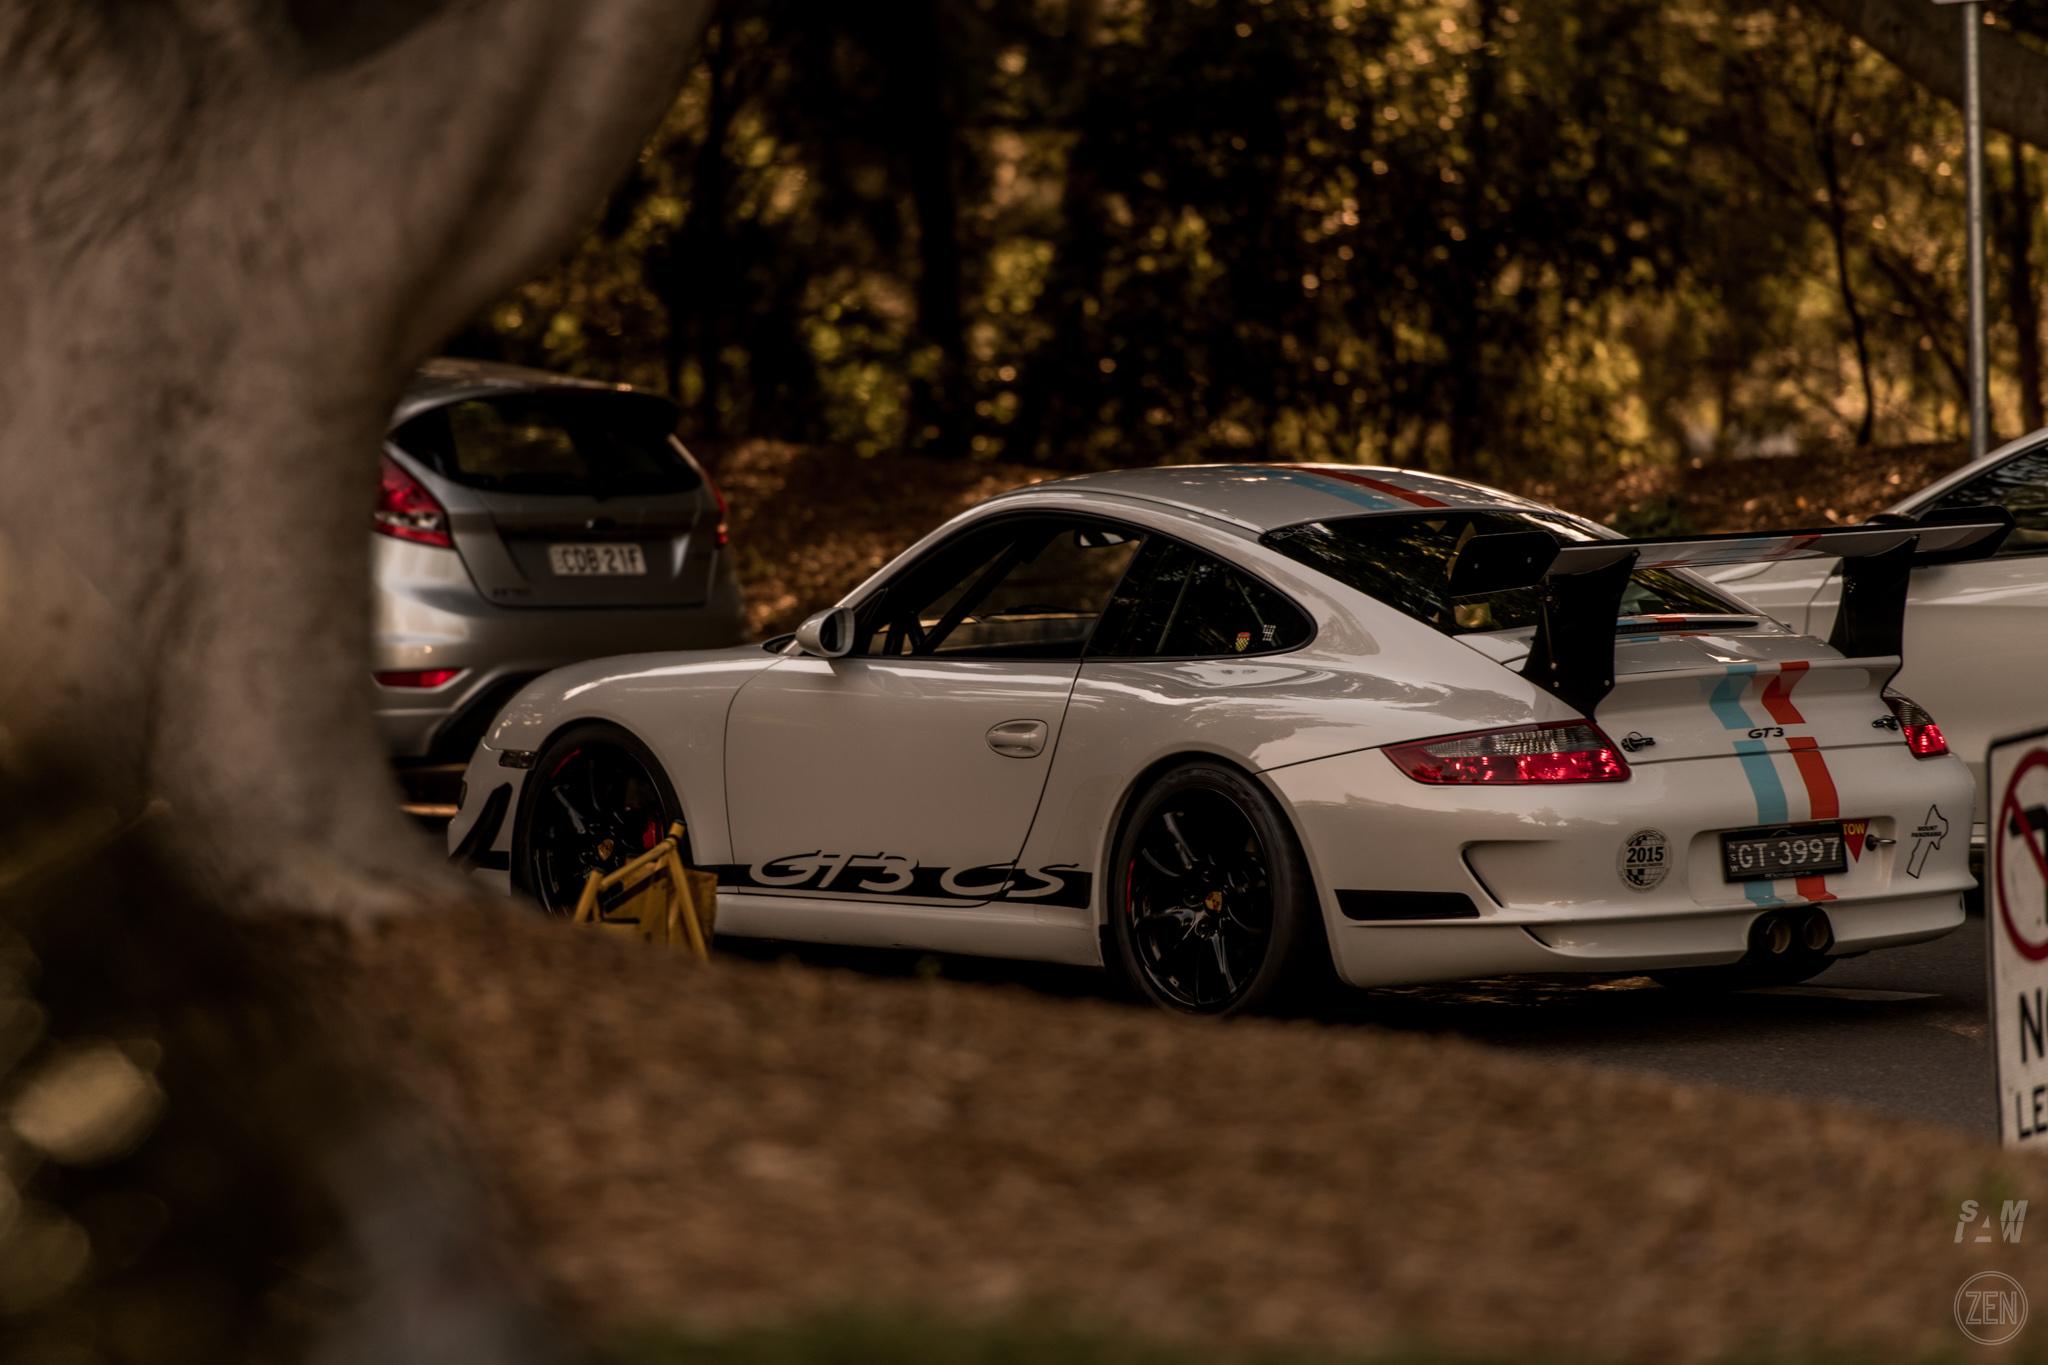 2019-10-27 - Autohaus Porsches & Coffee 073